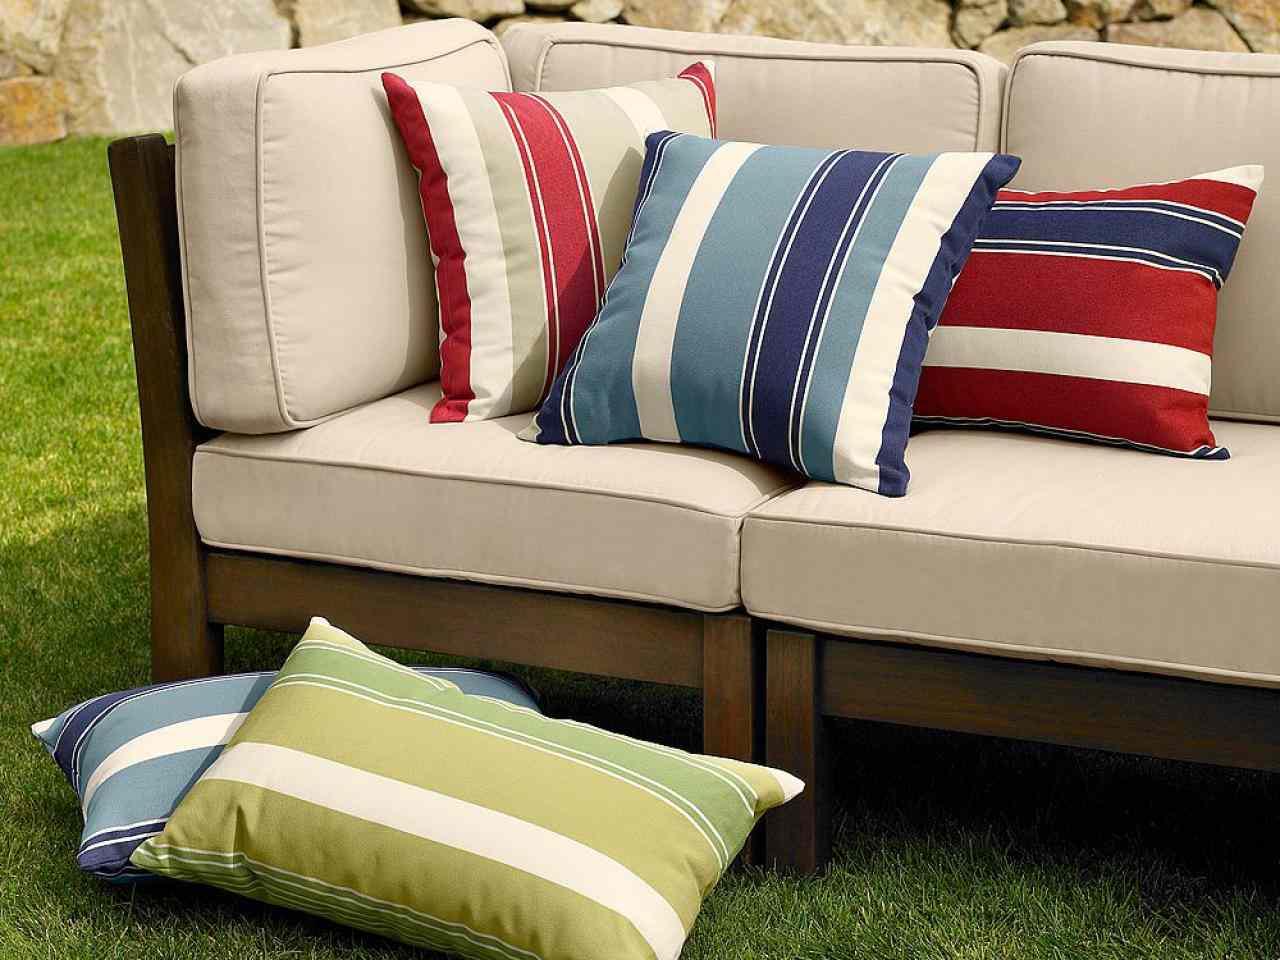 canape salon de jardin minimaliste deniser pas cher bleu